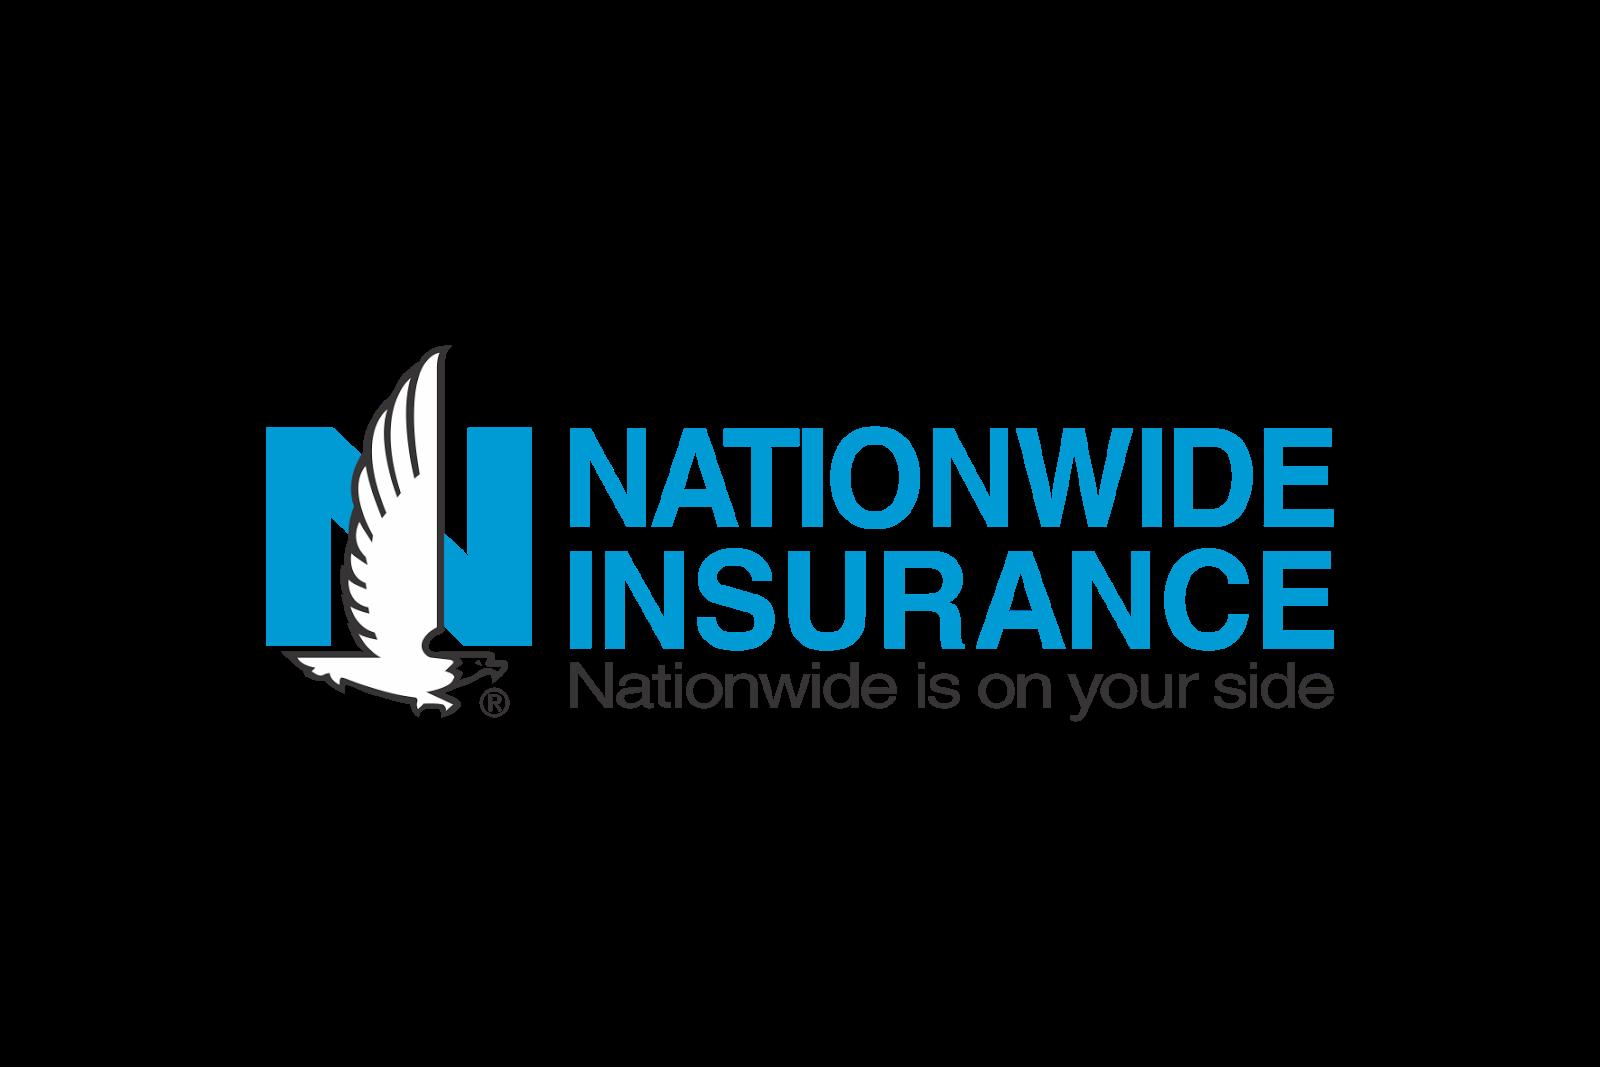 Insurance Company Writing Travel Insurance